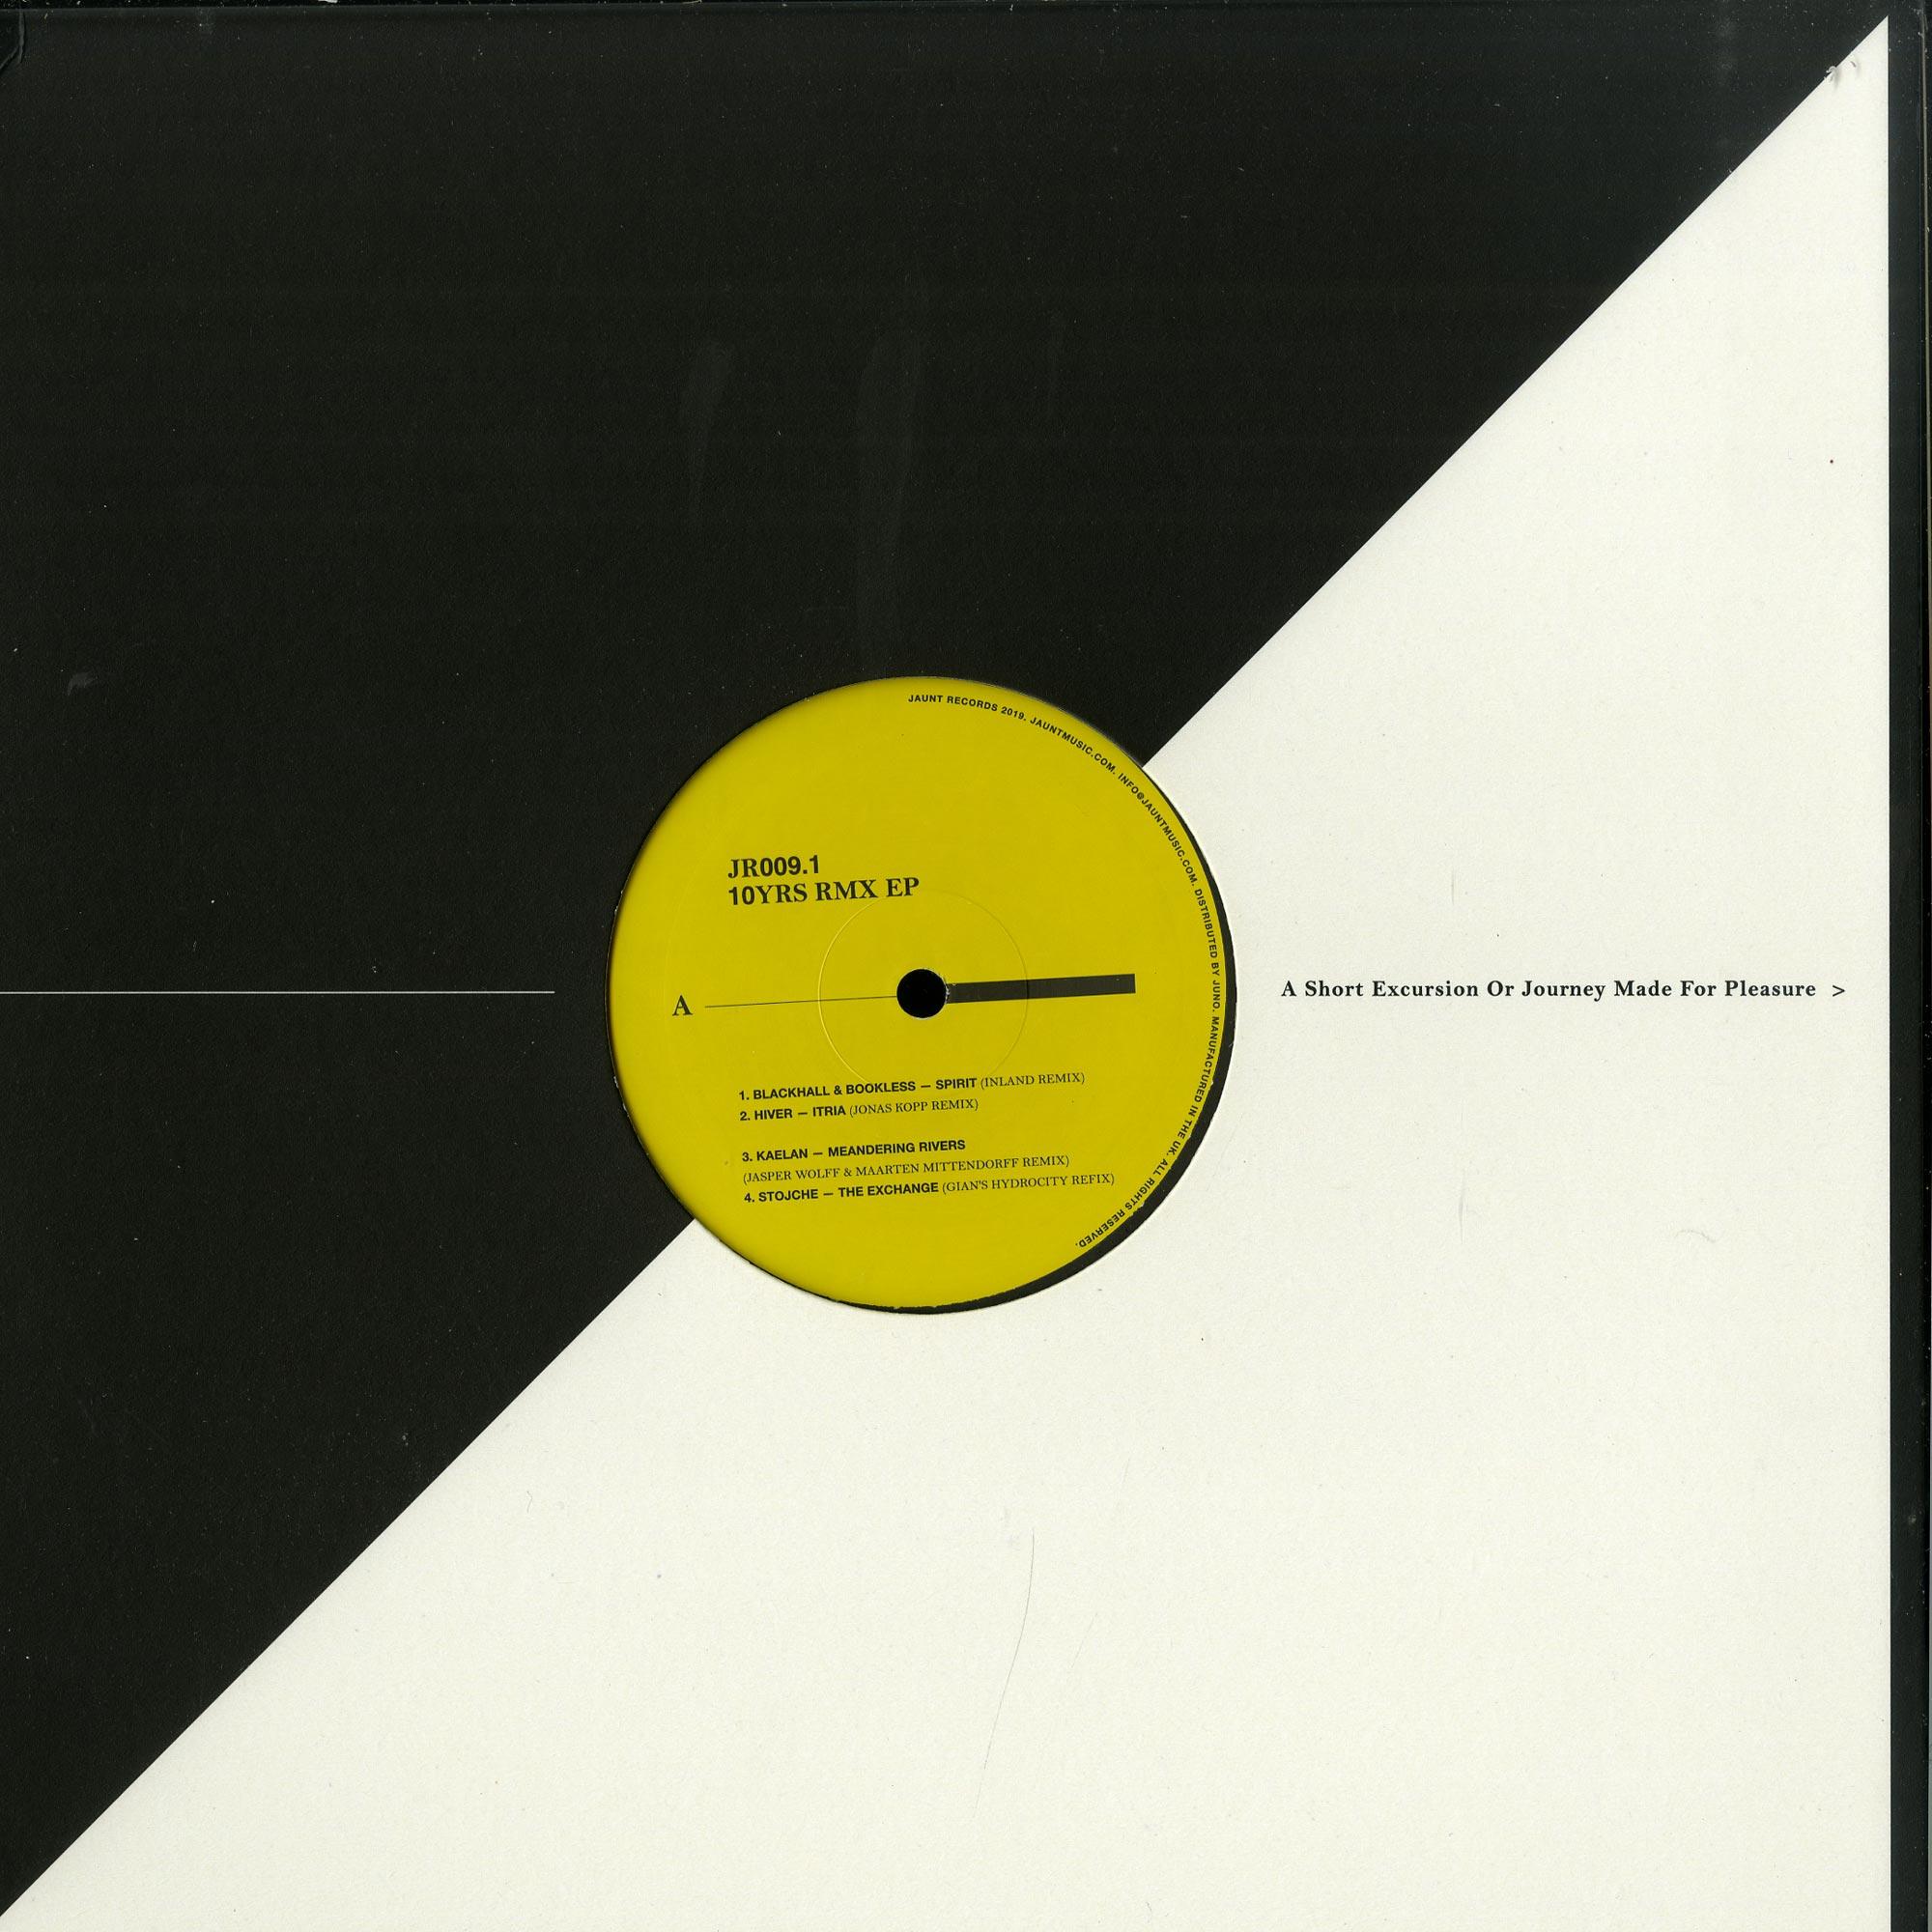 Blackhall & Bookless / Hiver / Kaelan / Stojche - 10 YRS RMX EP1